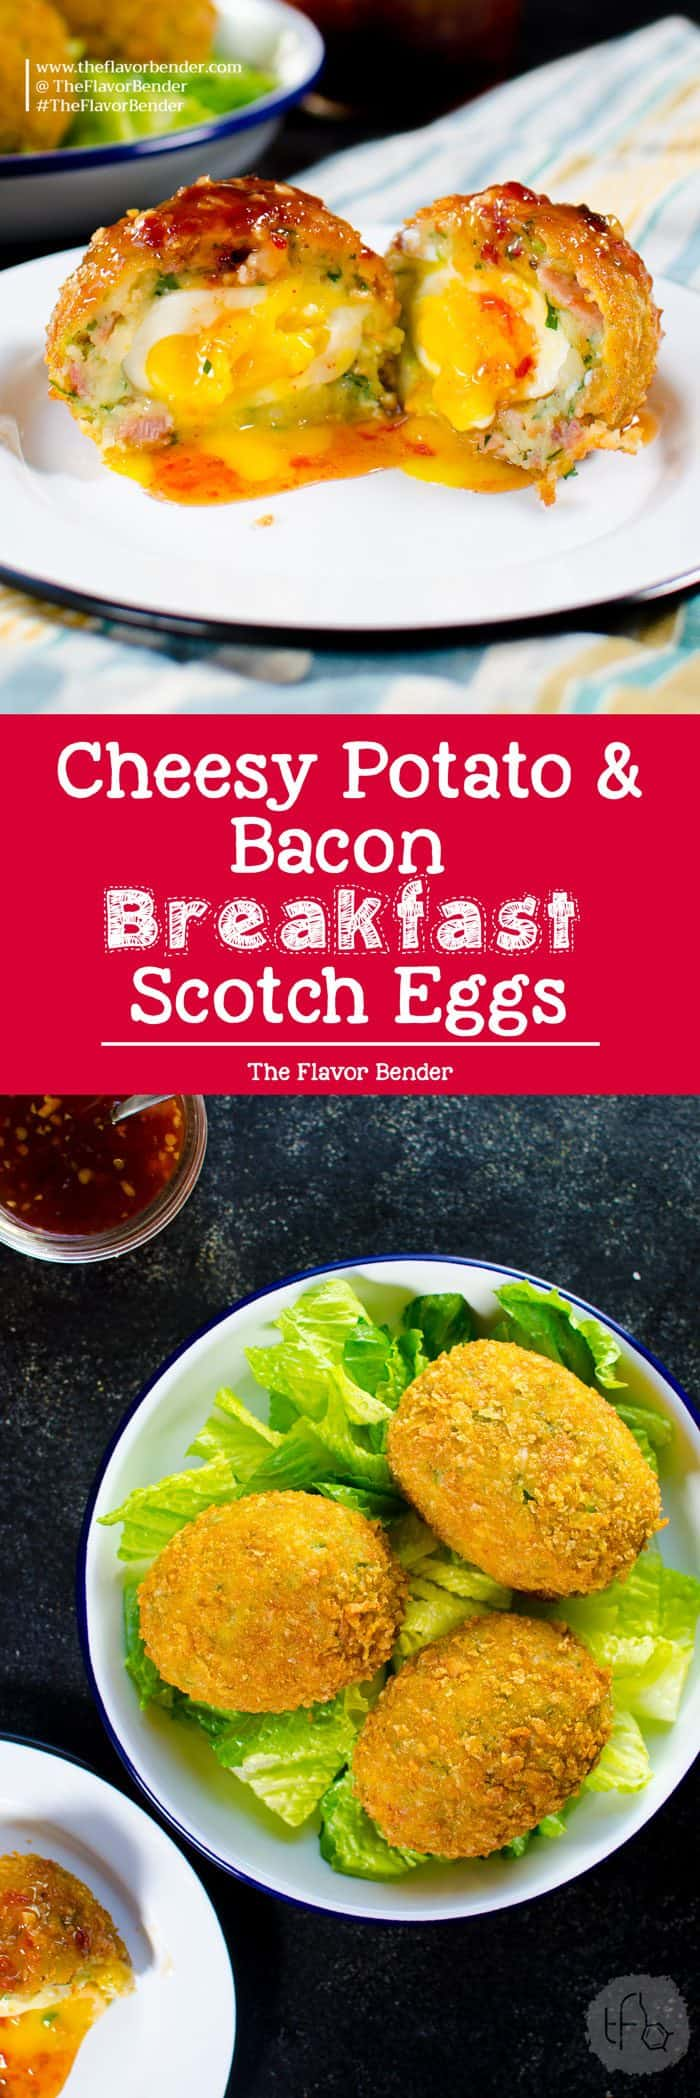 Cheesy Potato & Bacon Scotch Eggs. Extra special Breakfast Scotch eggs with Cheese, Potato, Bacon! Perfect Brunch or Breakfast Eggs.